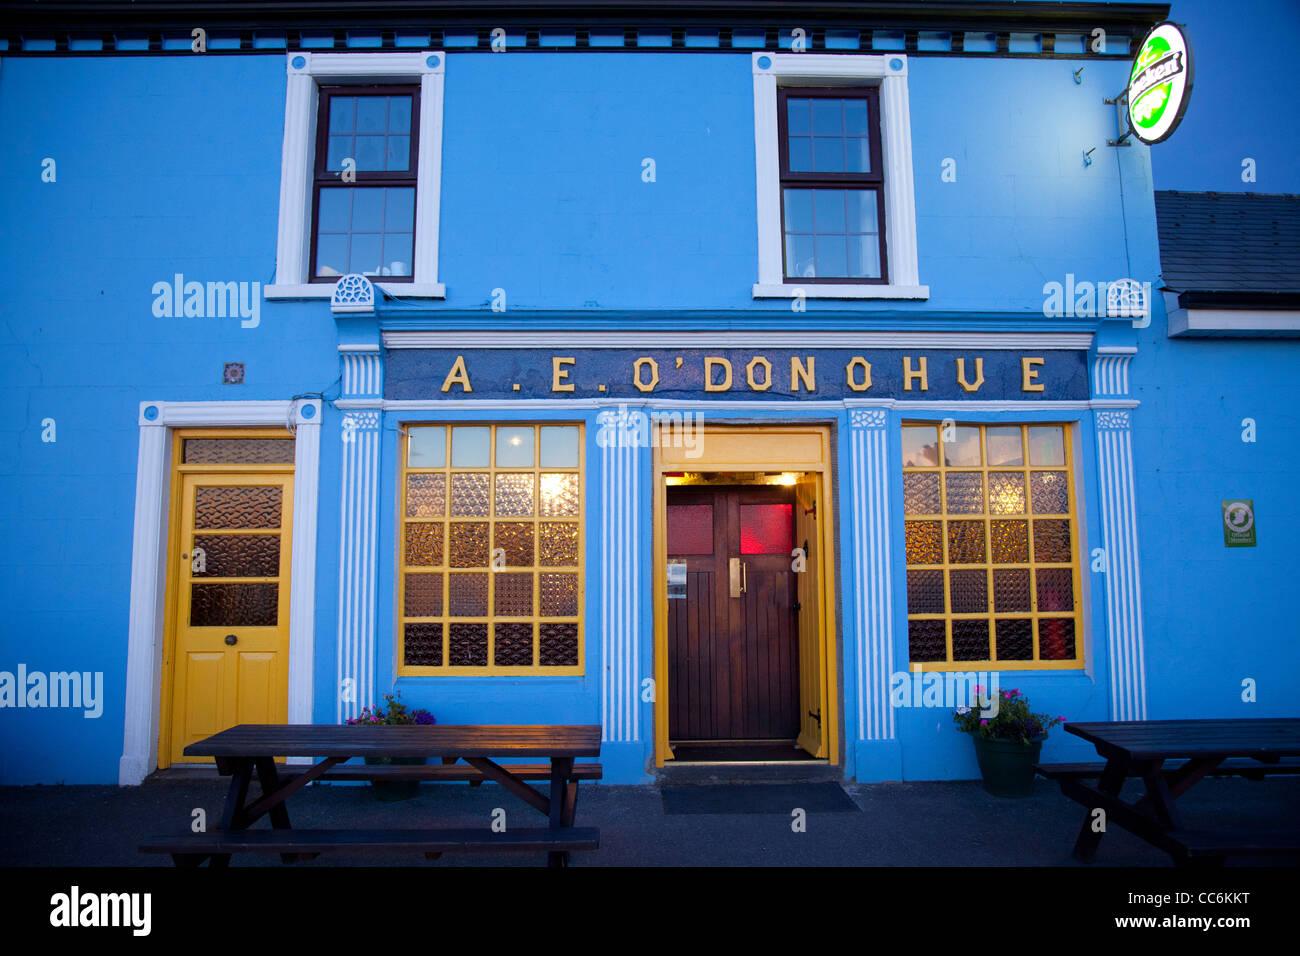 Colorida fachada de O'Donohue's Pub, Fanore, County Clare, Irlanda. Imagen De Stock